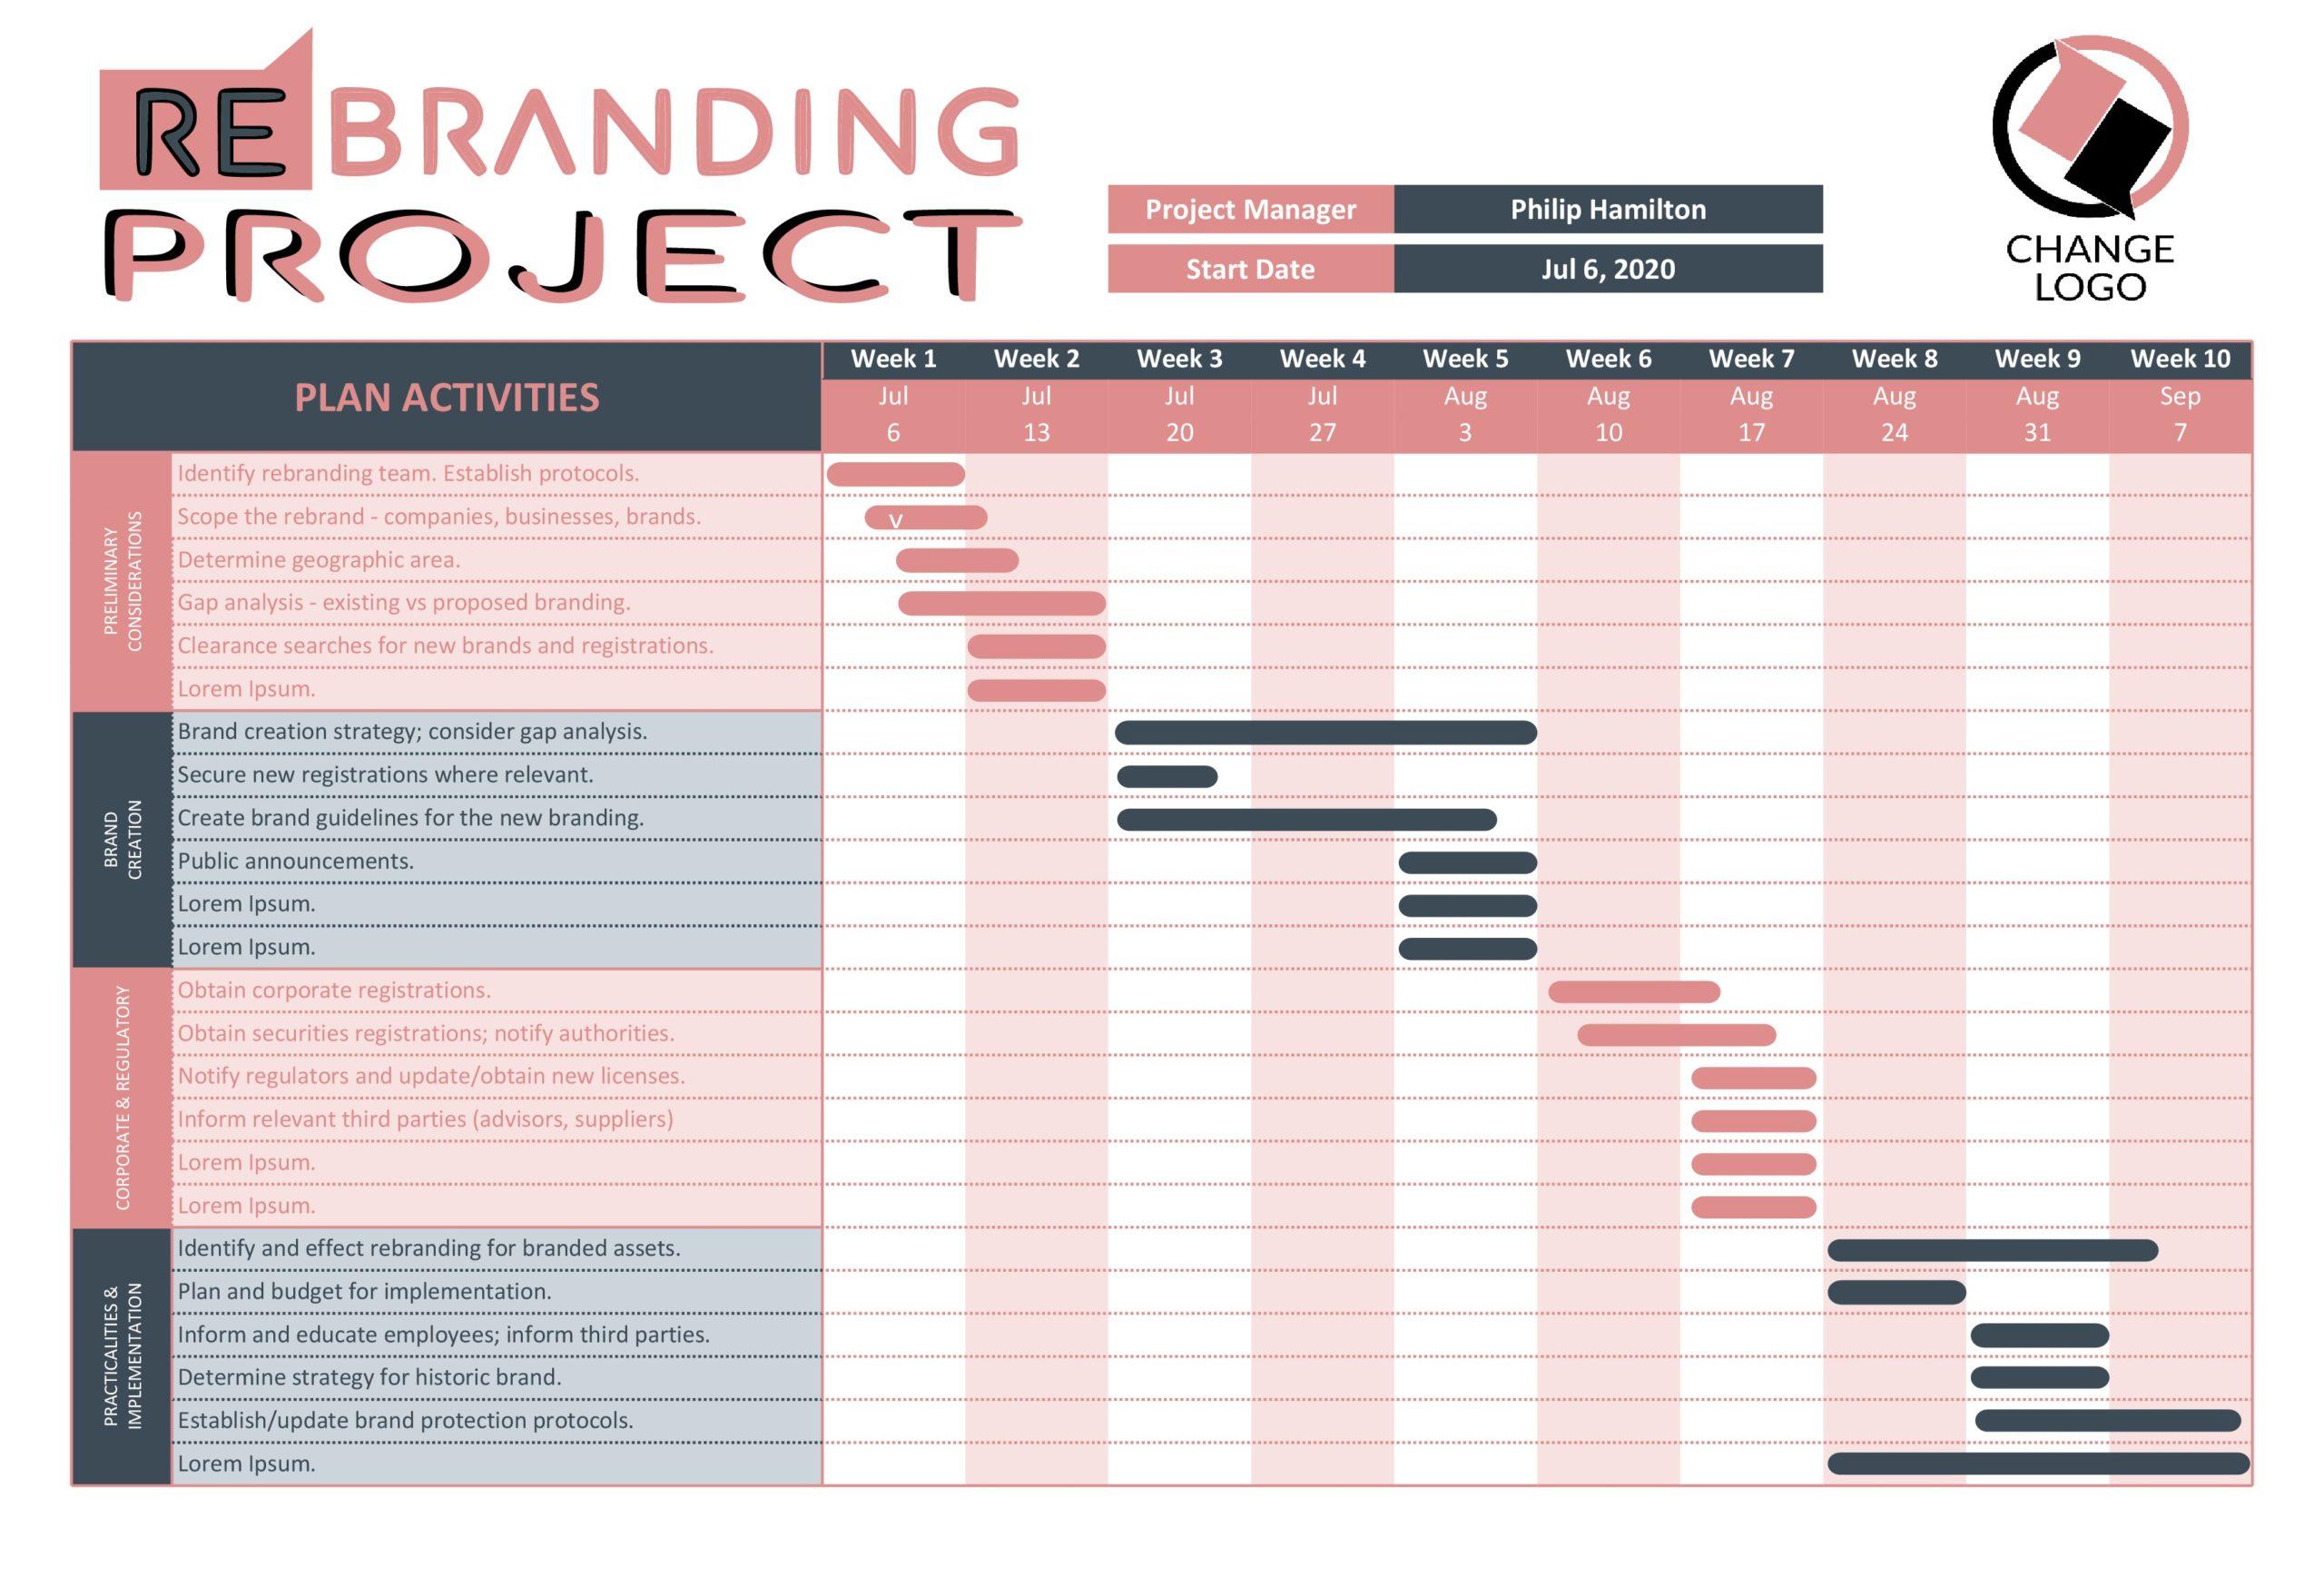 Free Rebranding Project Plan Template - TemplateLab.com